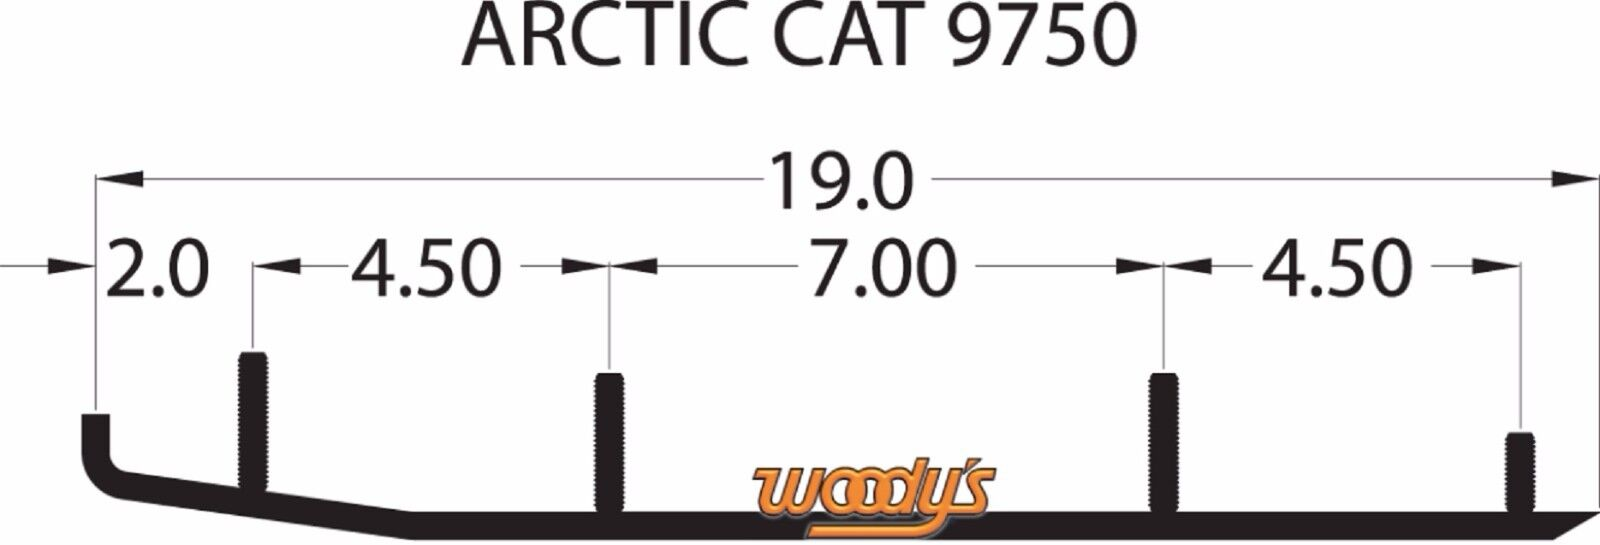 Woodys Trail Blazer Carbide Wear Bars Runners Arctic Cat